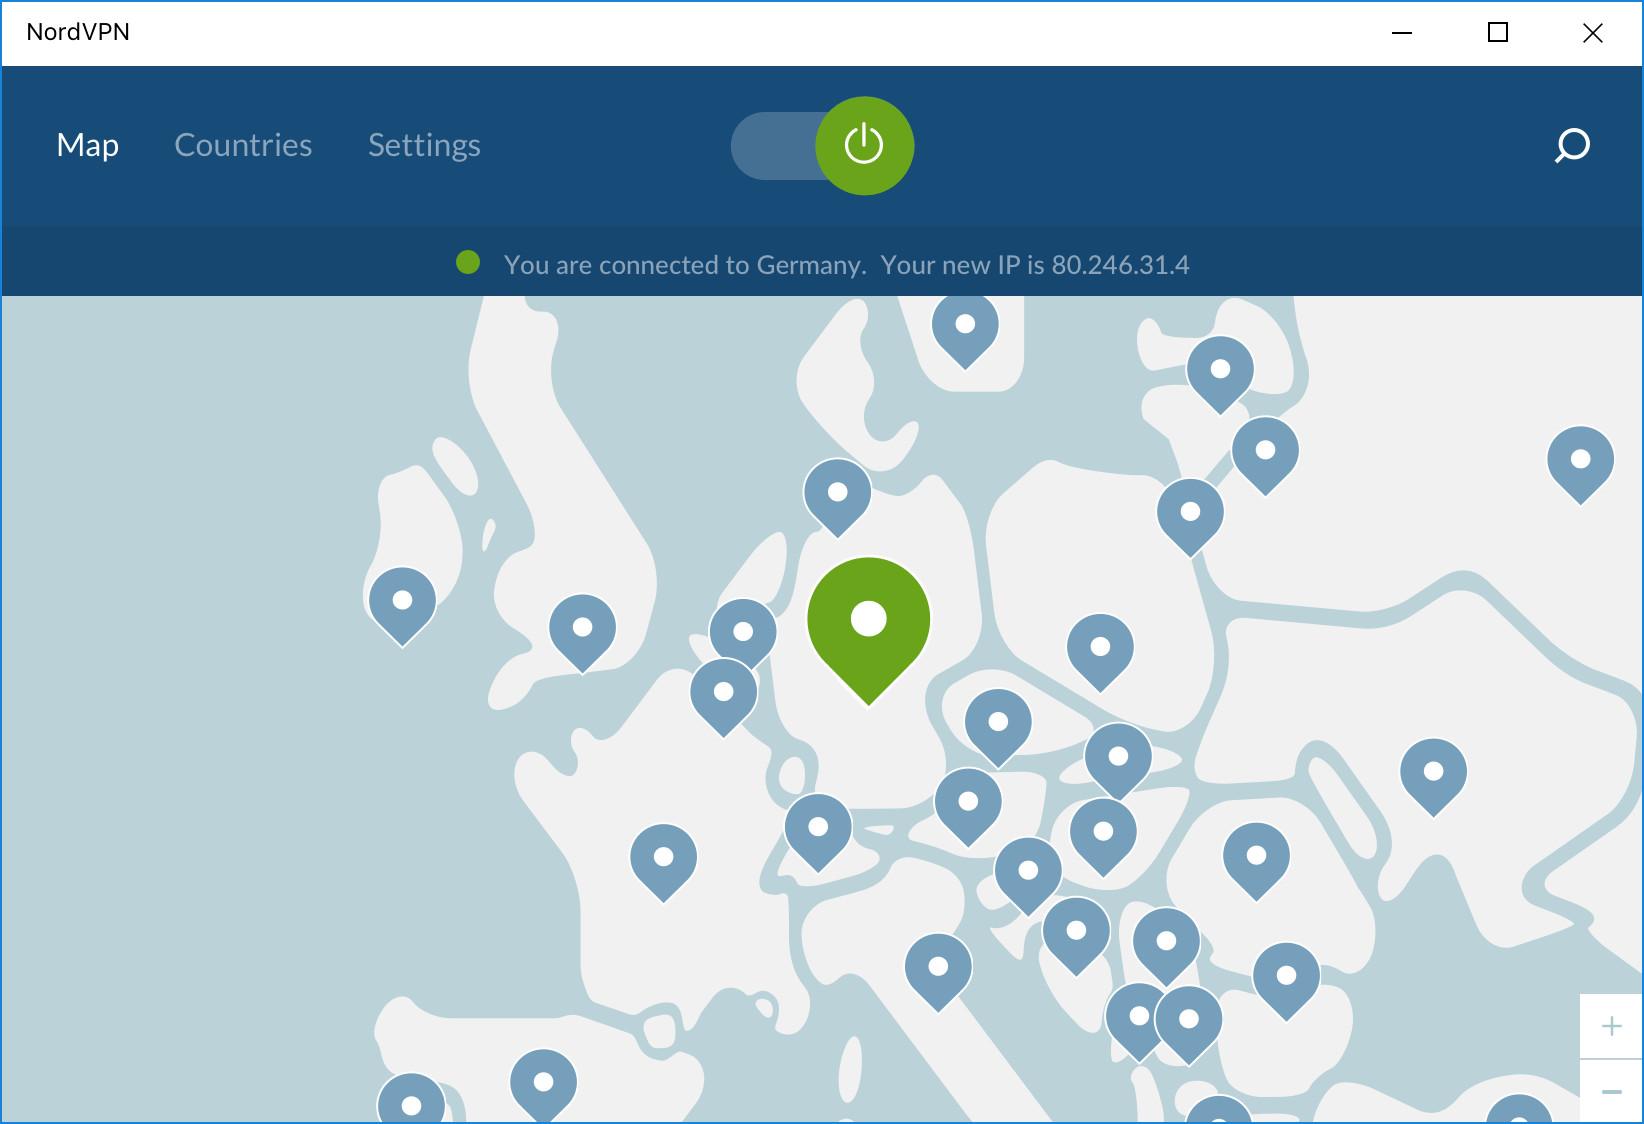 Screenshot 1 - NordVPN